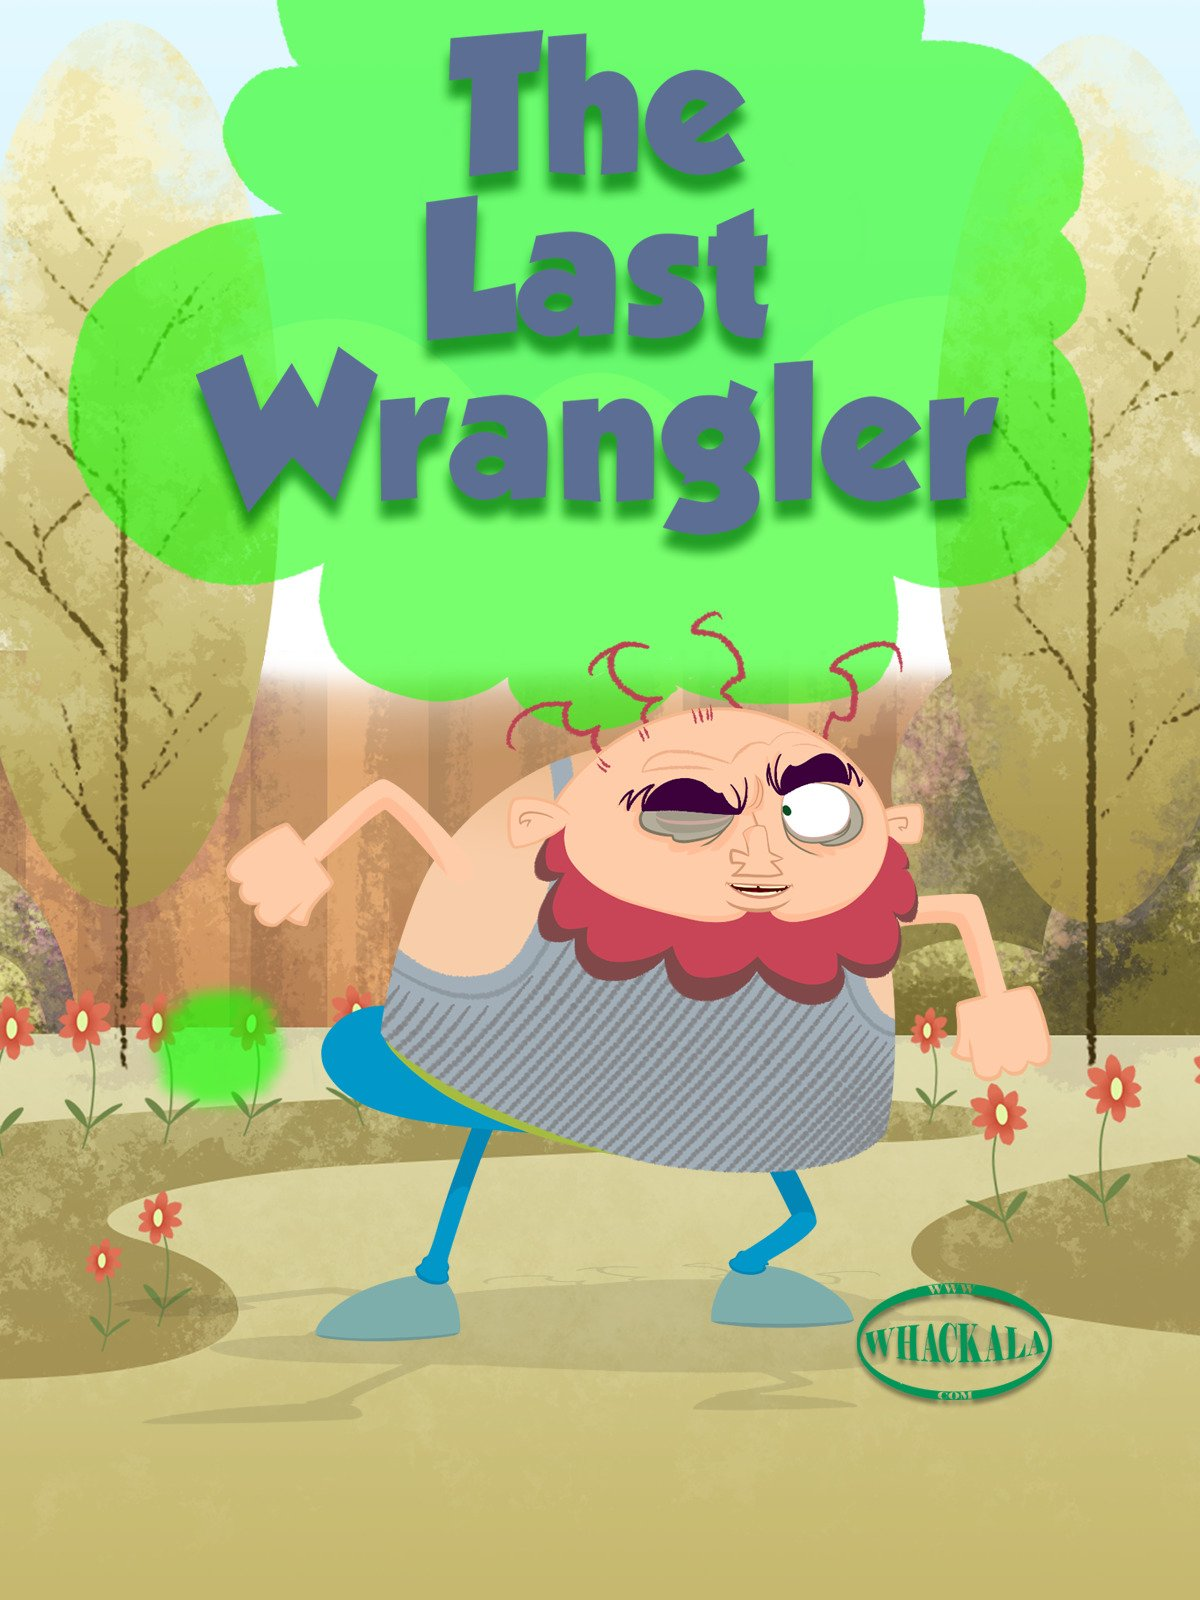 The Last Wrangler